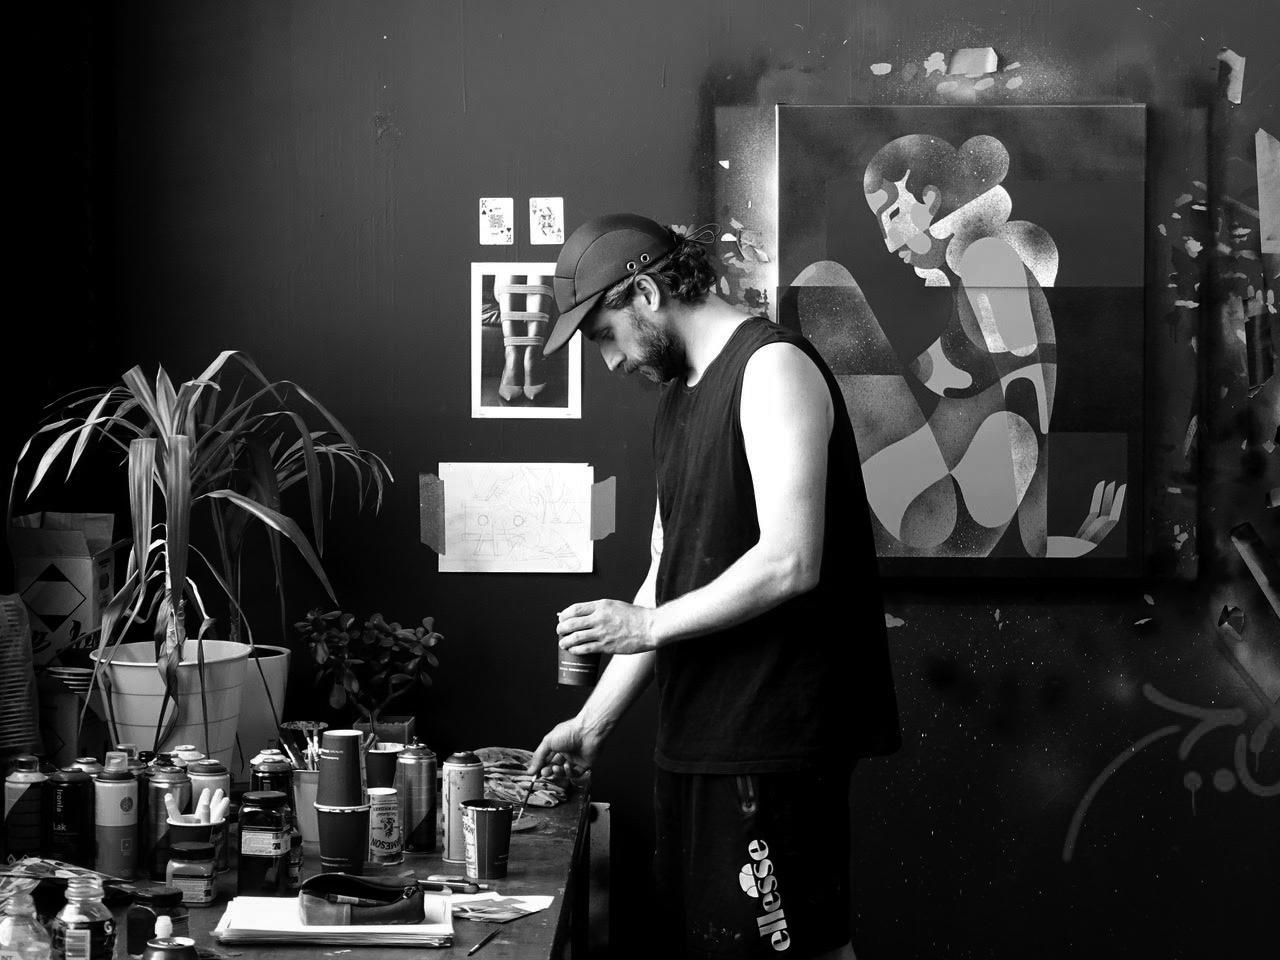 Backwoods Gallery artist James Reka